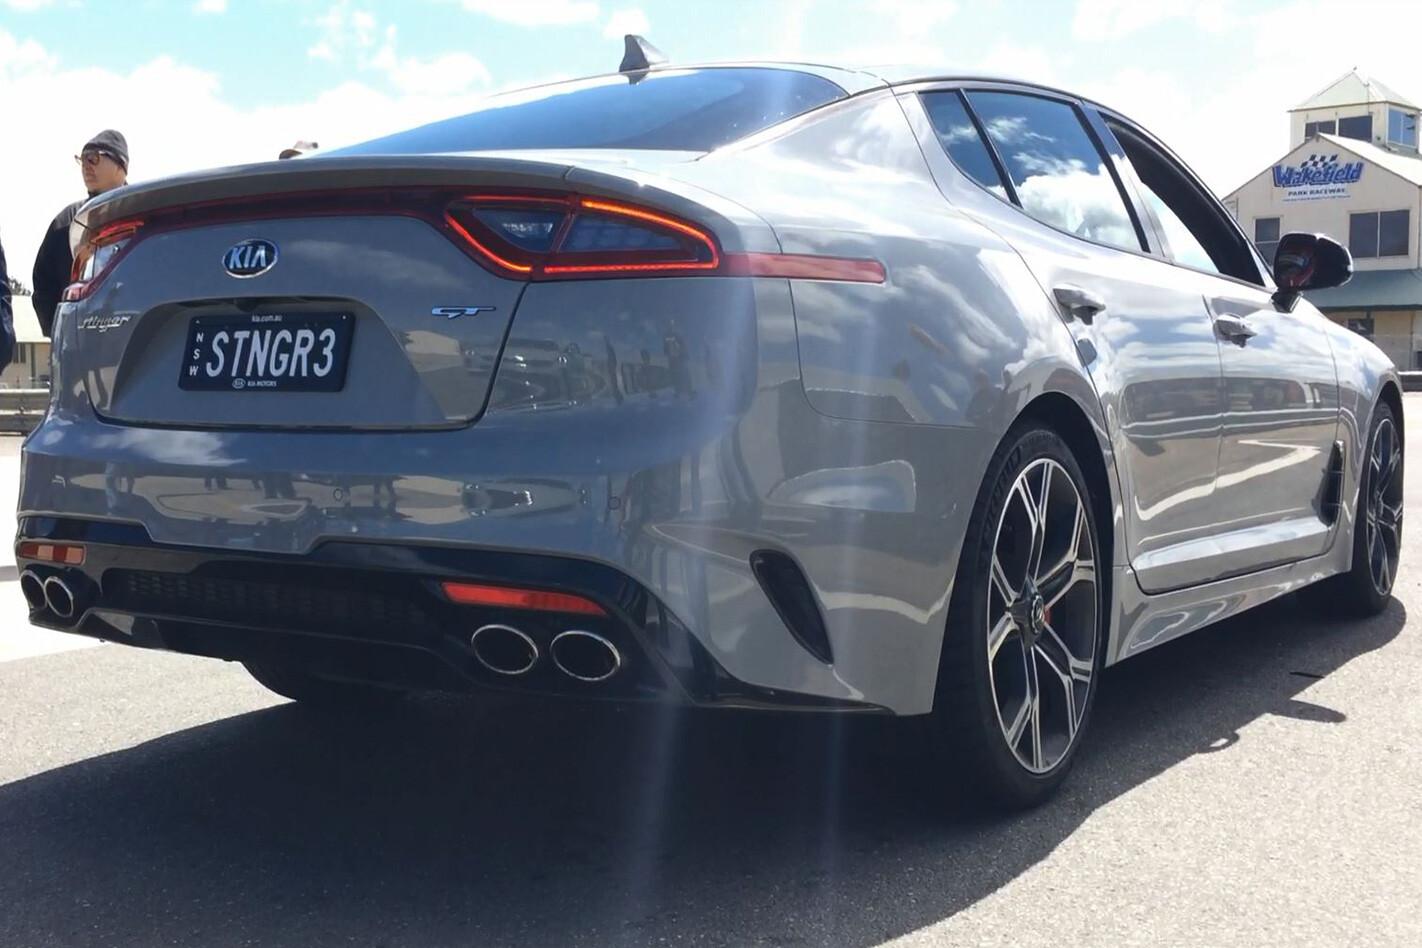 2018 Kia Stinger GT rear